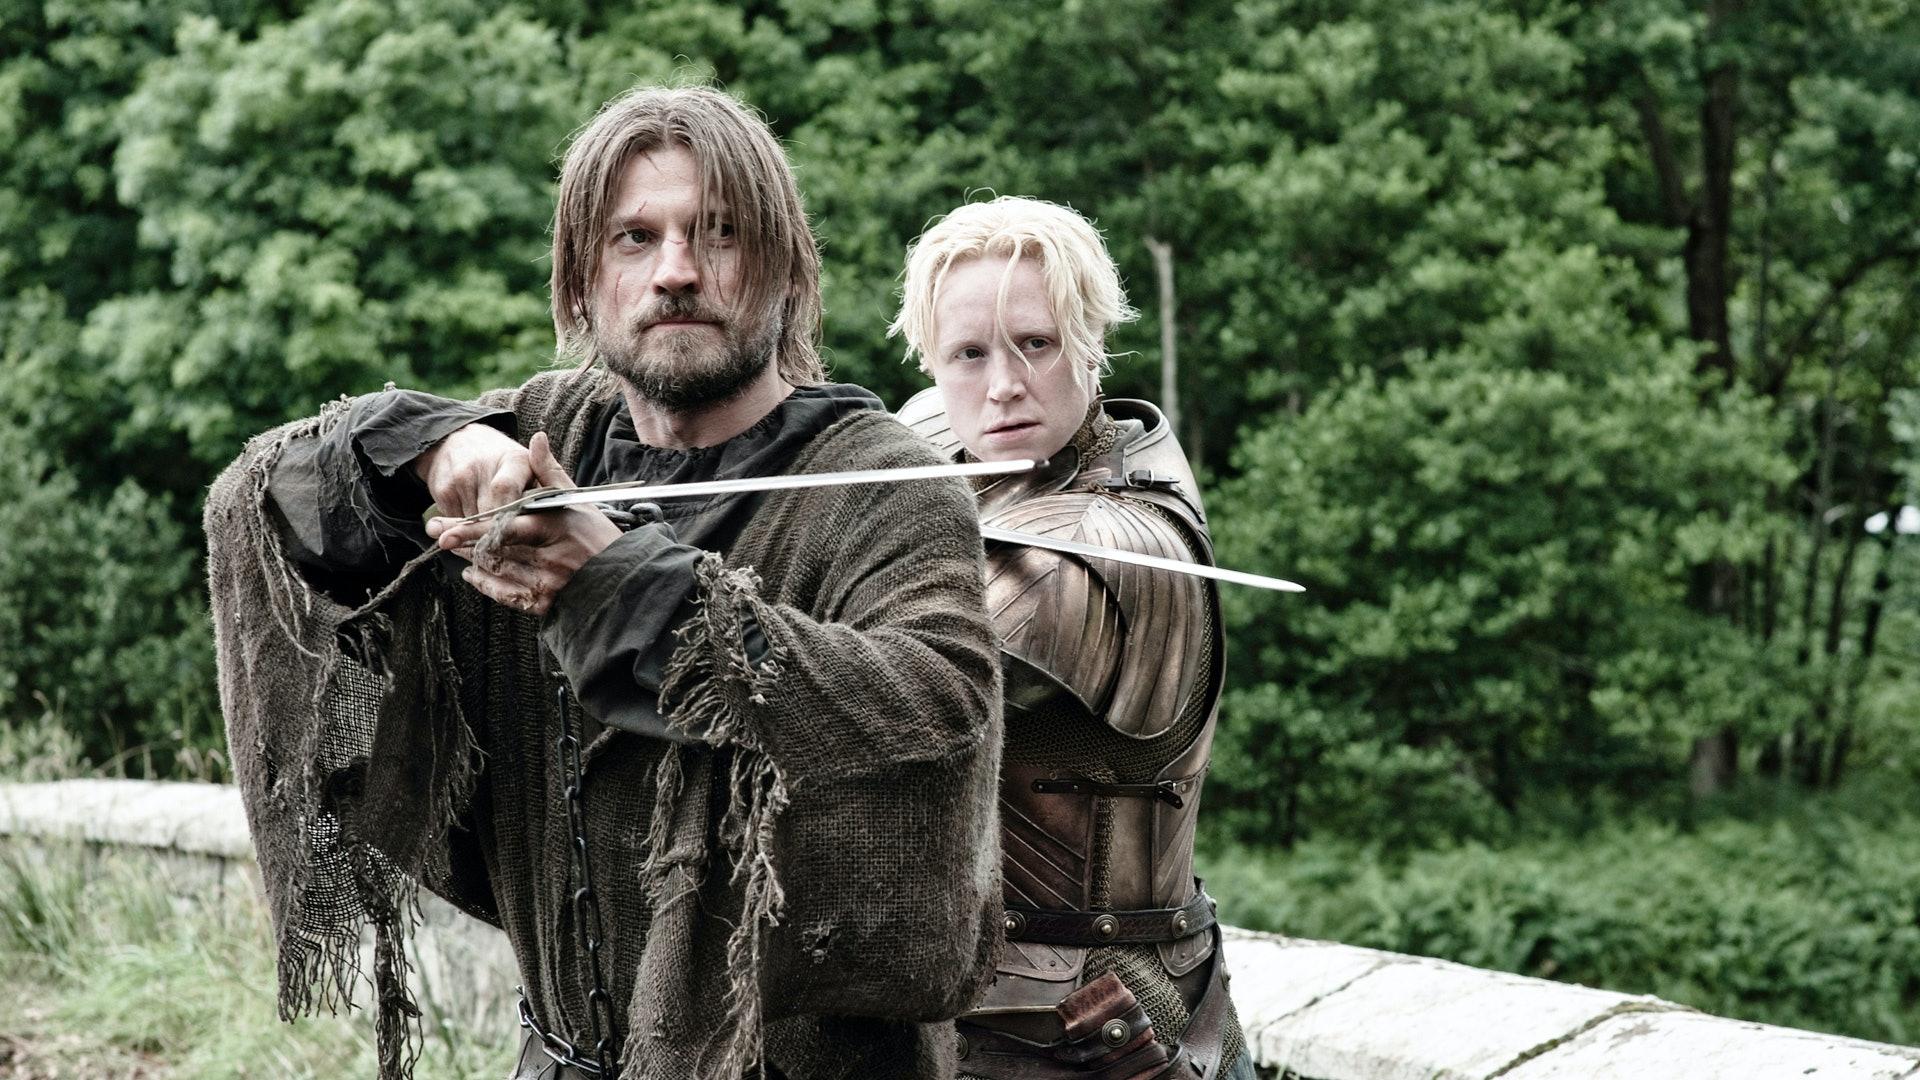 Jaime and Brienne in 'Game of Thrones' Season 3